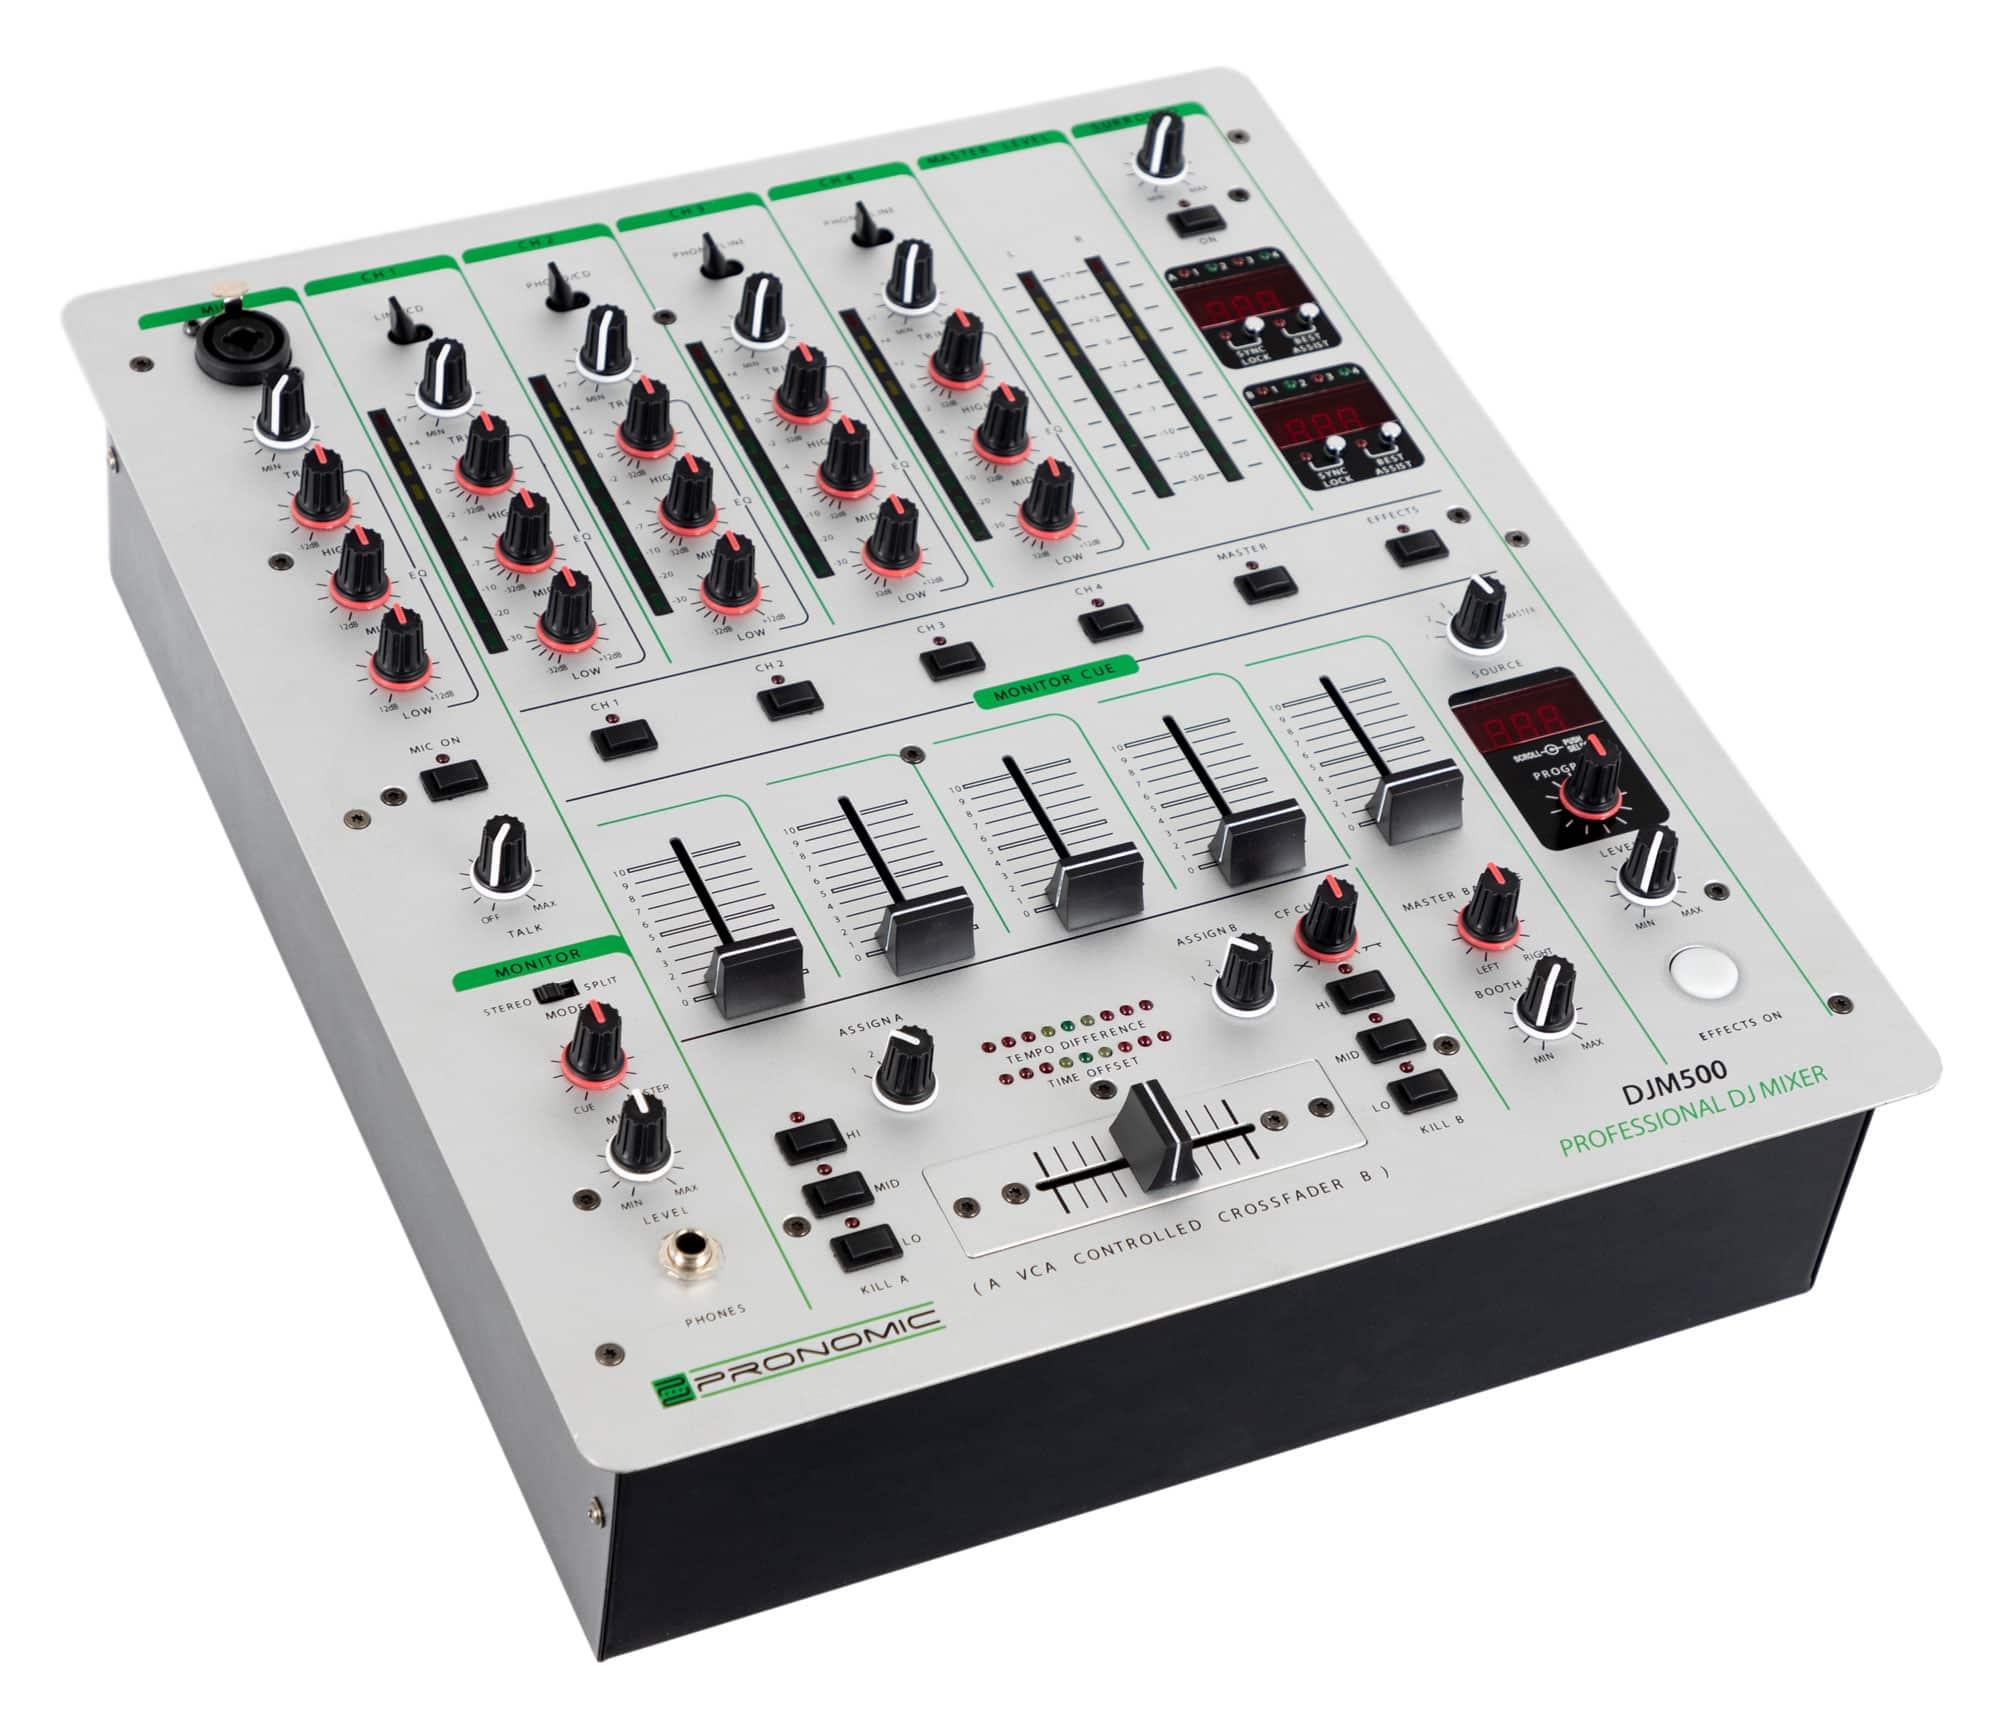 Pronomic DJM500 5 Kanal DJ Mixer